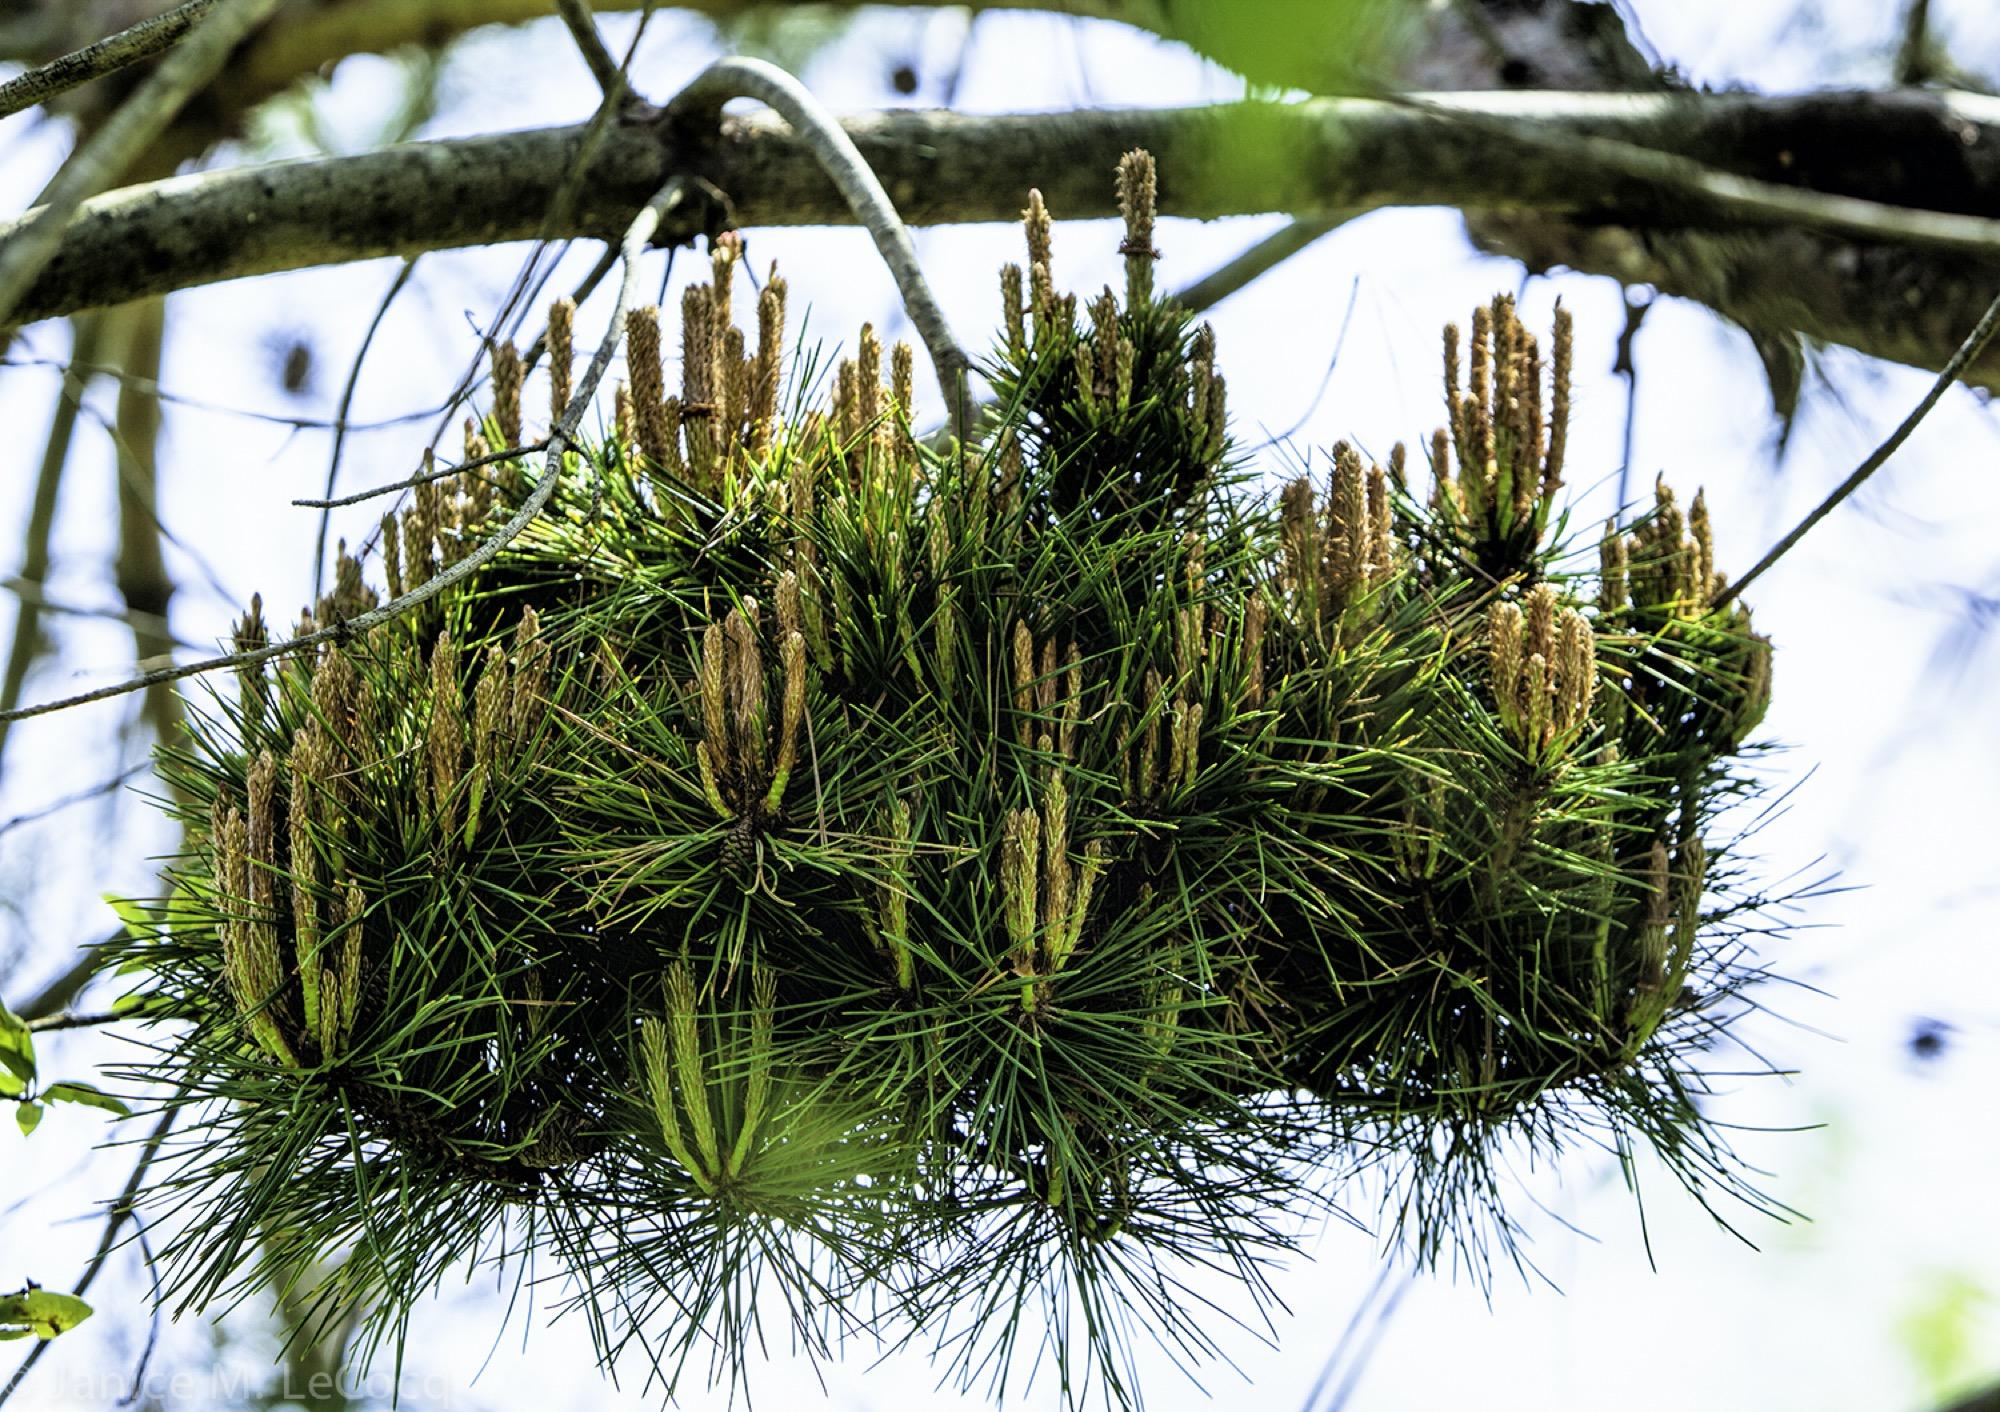 conifers, pine trees